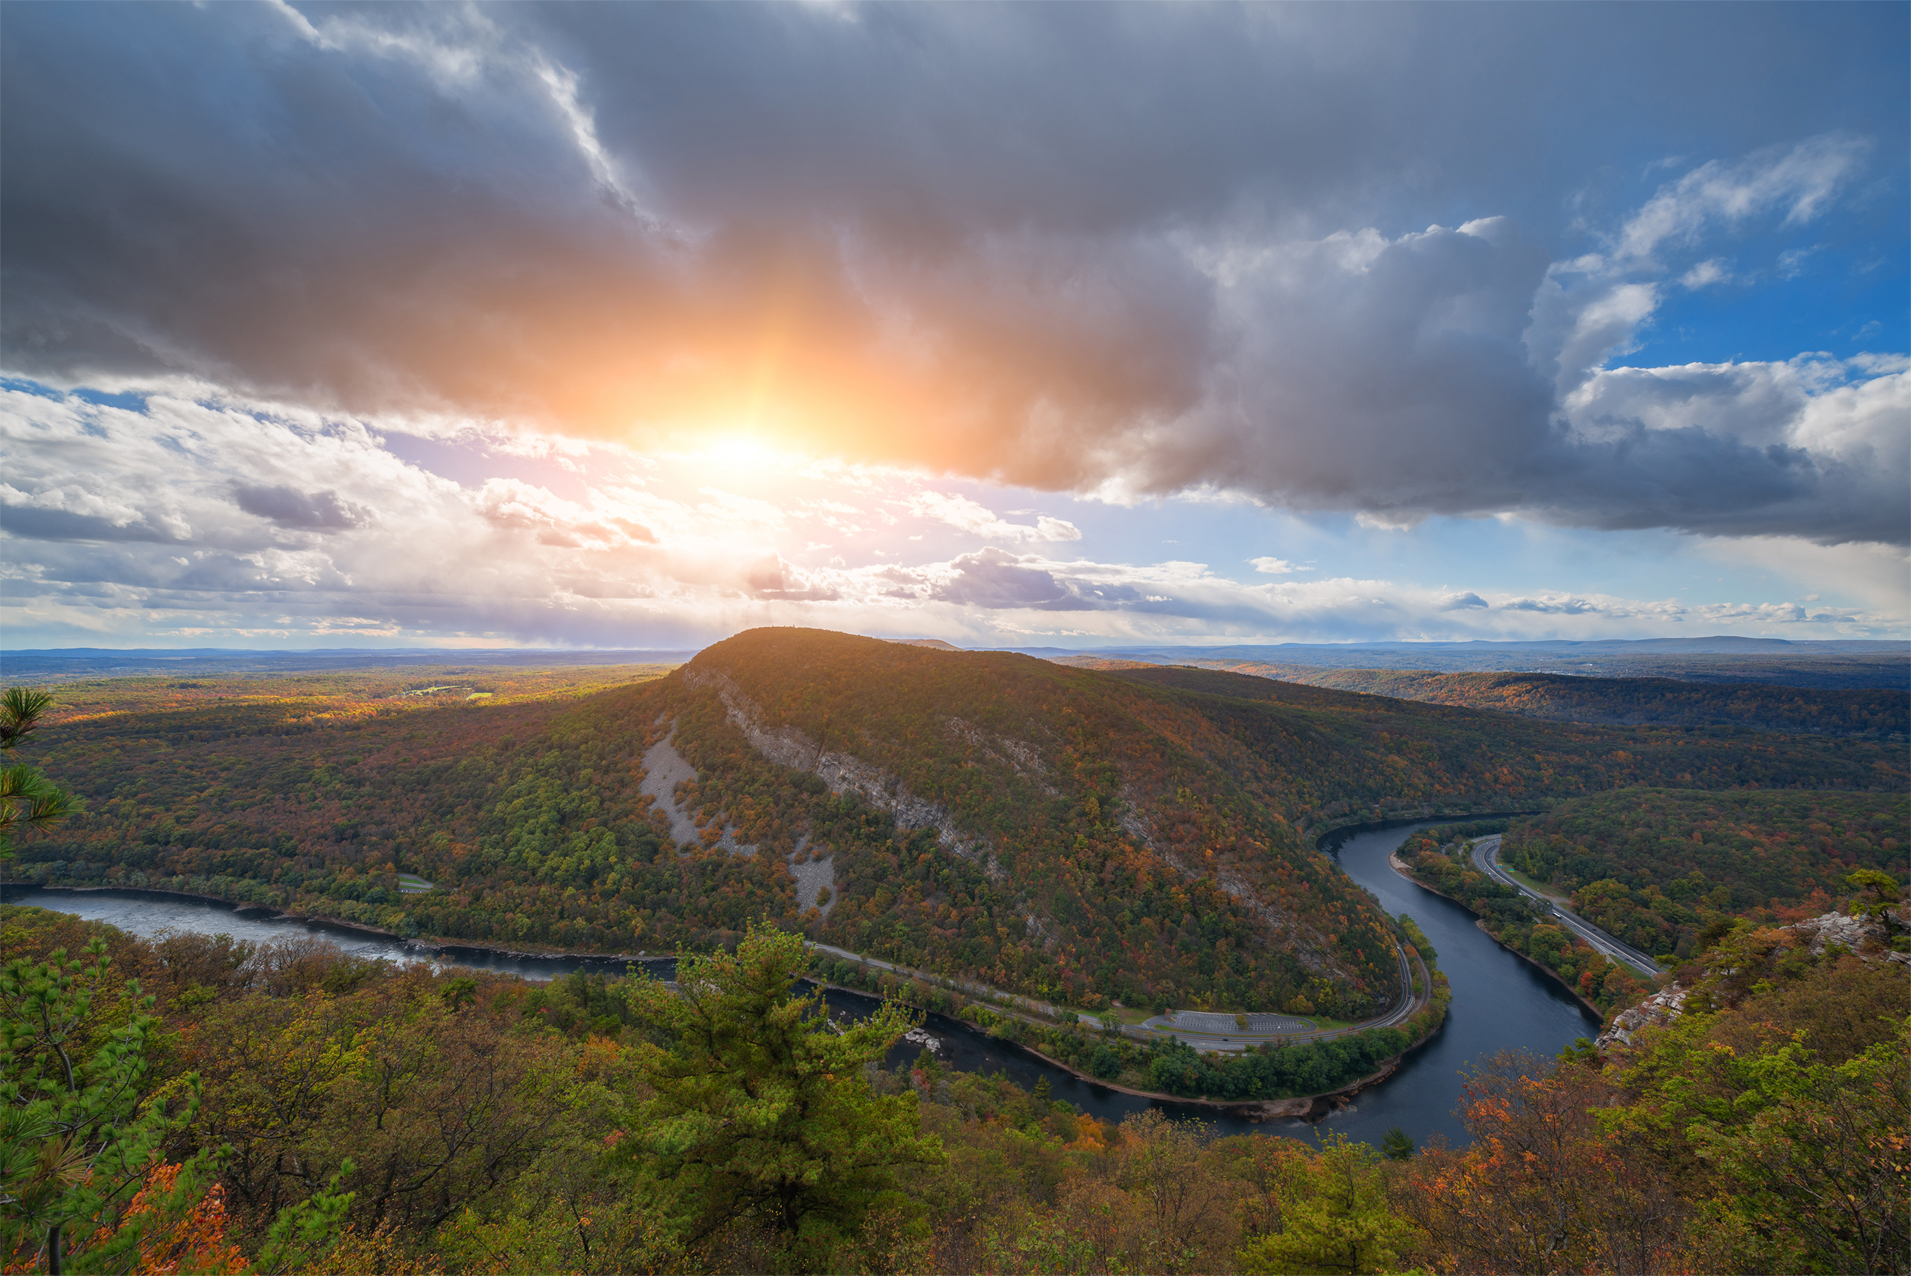 Pocono Mountain Rentals built smarter property operations with Breezeway